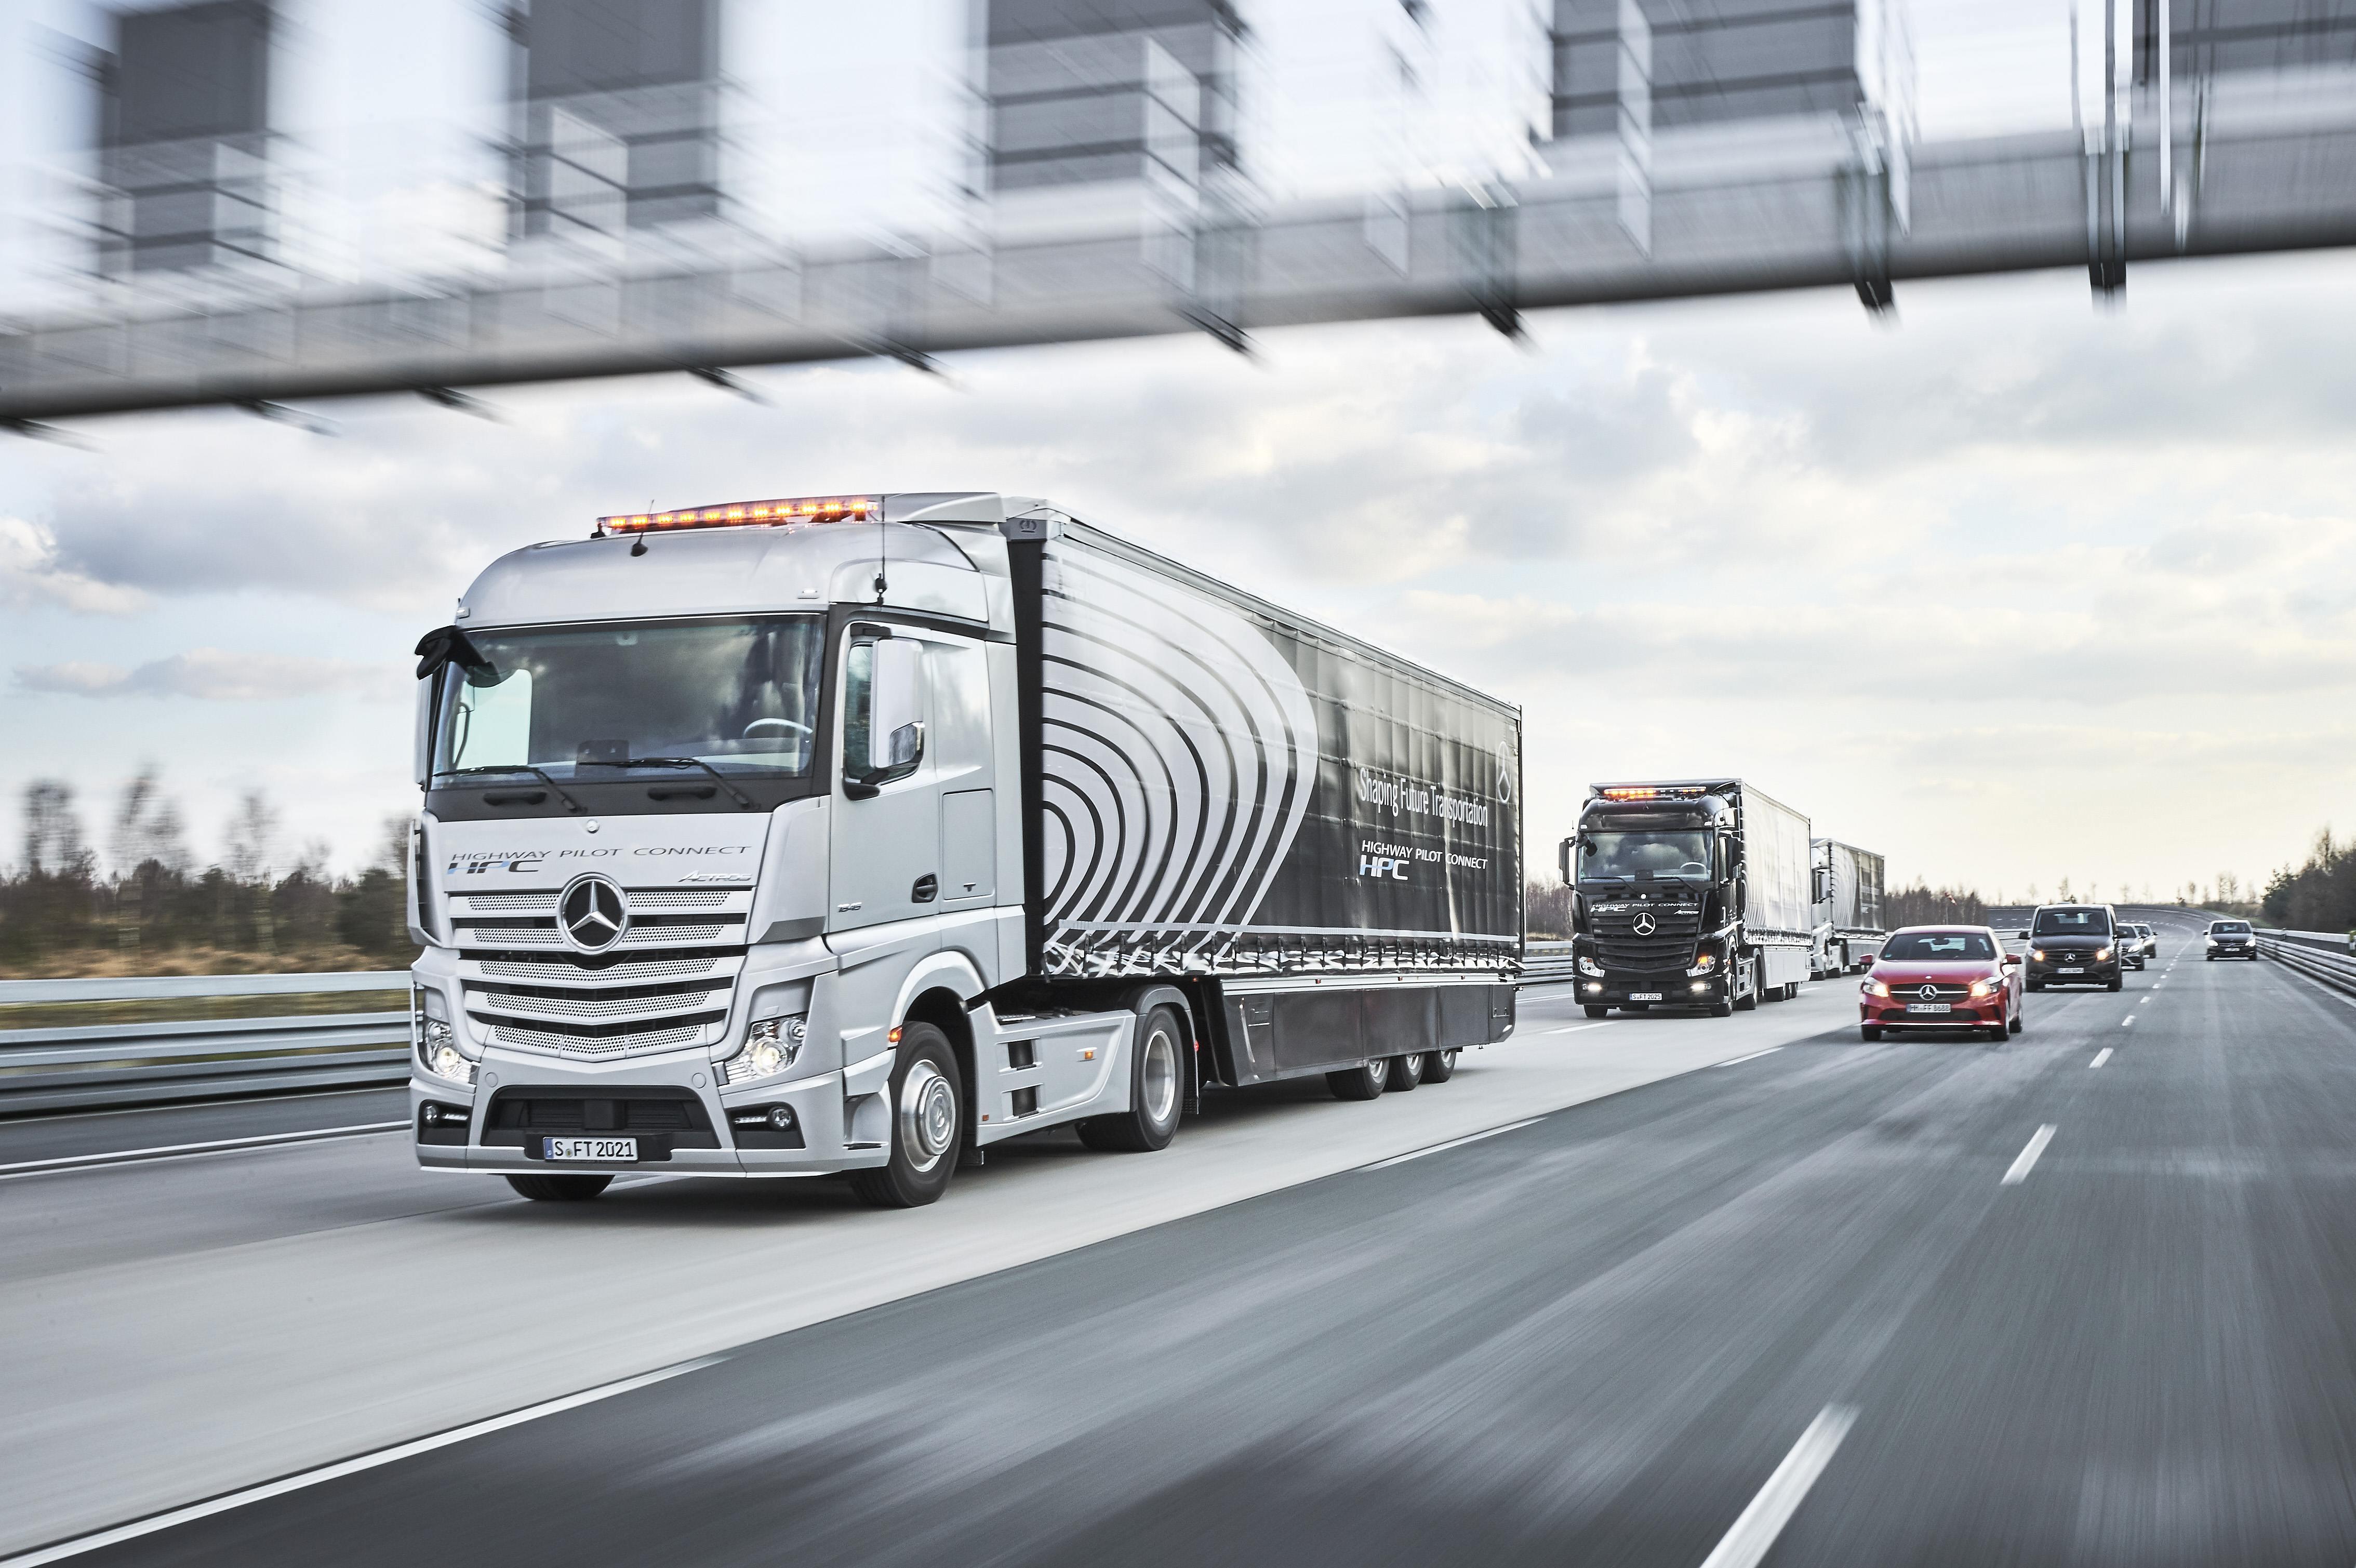 Daimler Autonomous Truck Platoon on Highways next to cars